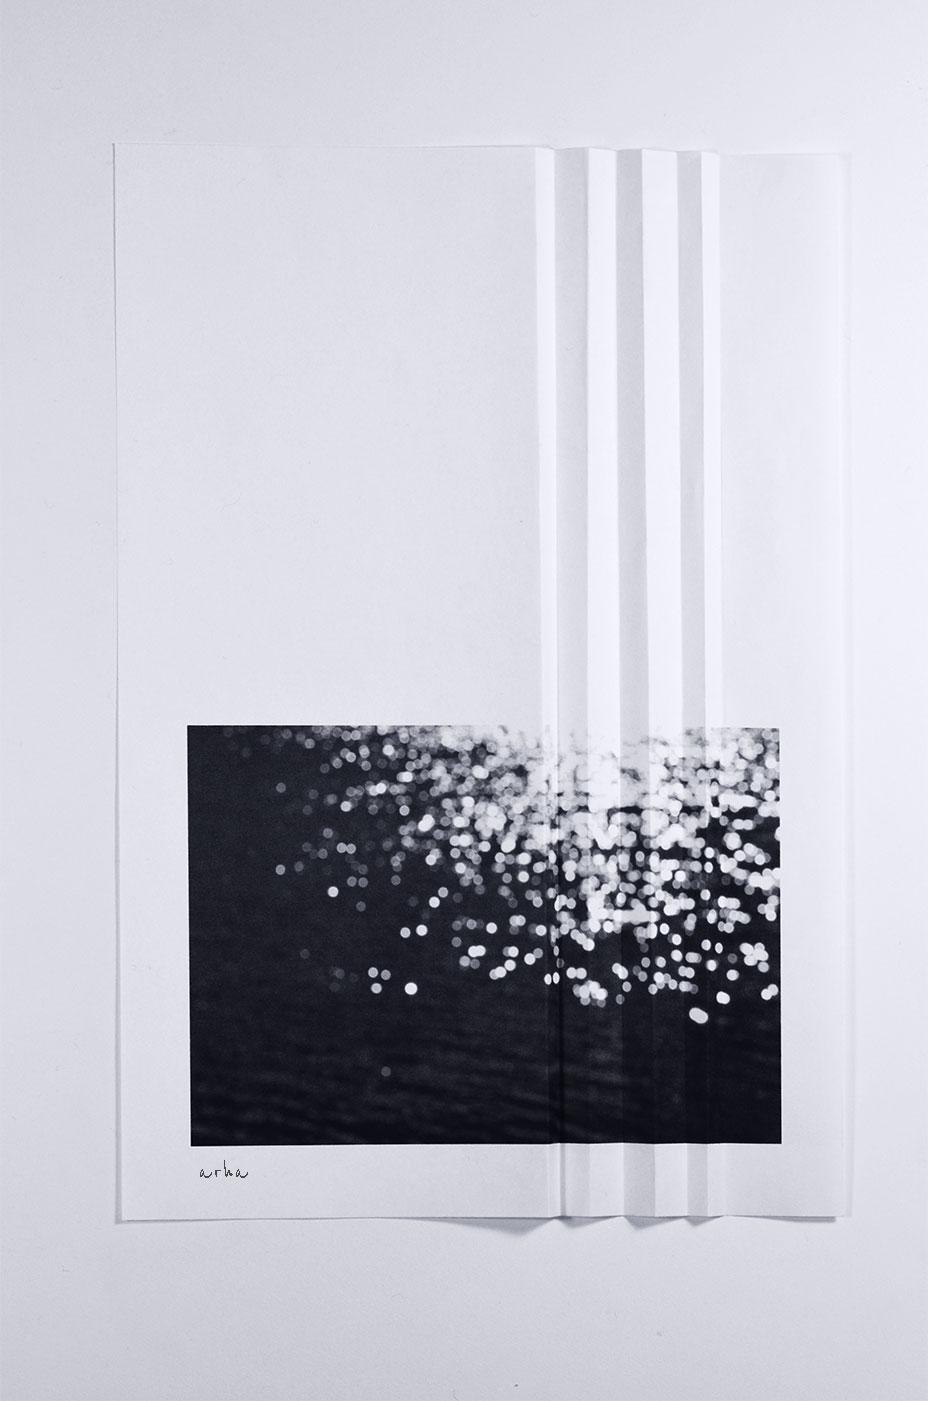 wave-bokeh-line-minimalism-copyright-2013-arha-Tomomichi-Morifuji